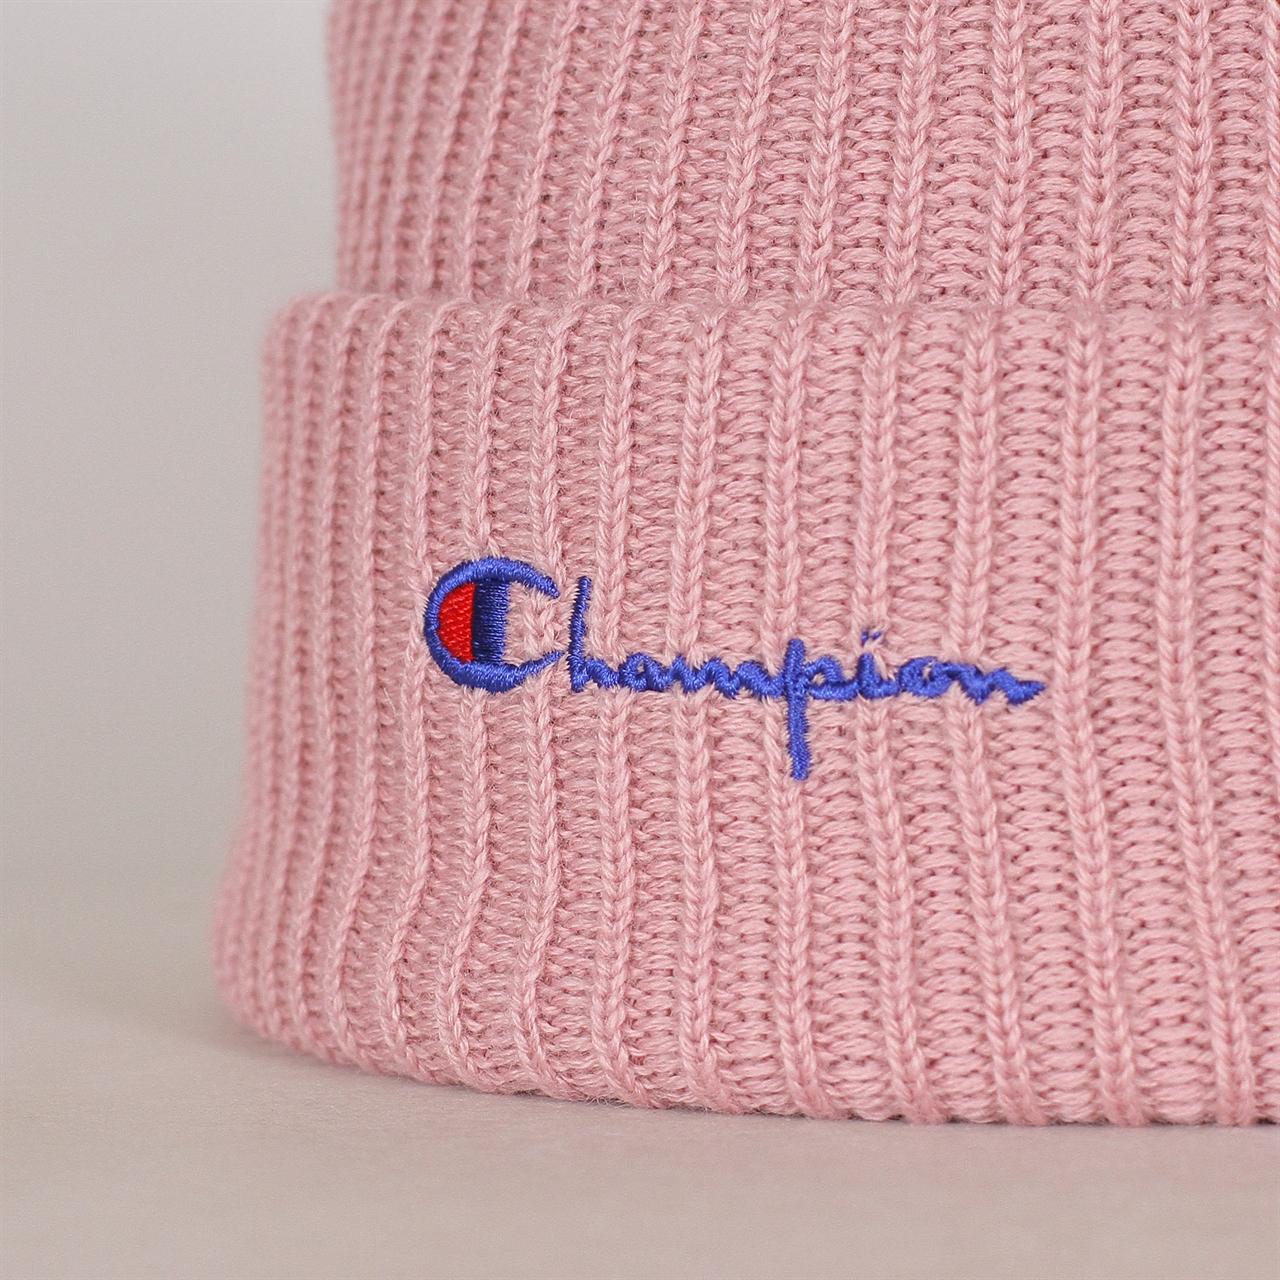 30cb4dbc5dd4a Shelta - Champion U.S.A. Beanie Cap (804412-PS096)